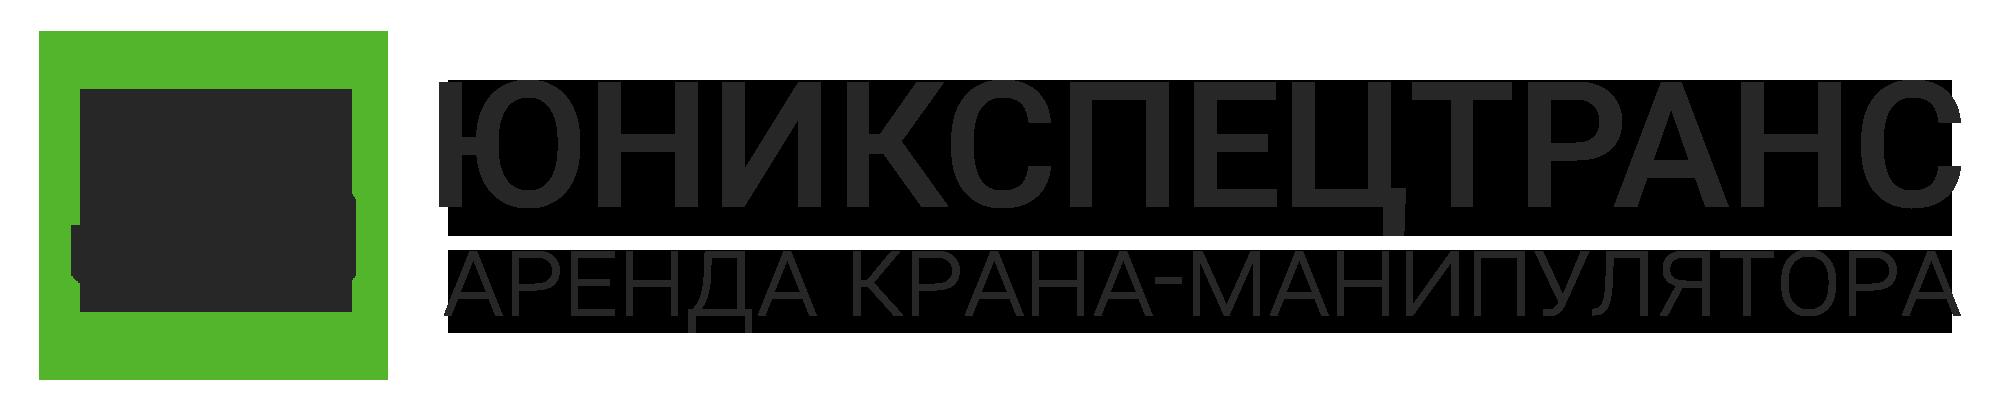 Аренда крана манипулятора в Москве и области недорого. ЮникСпецТранс